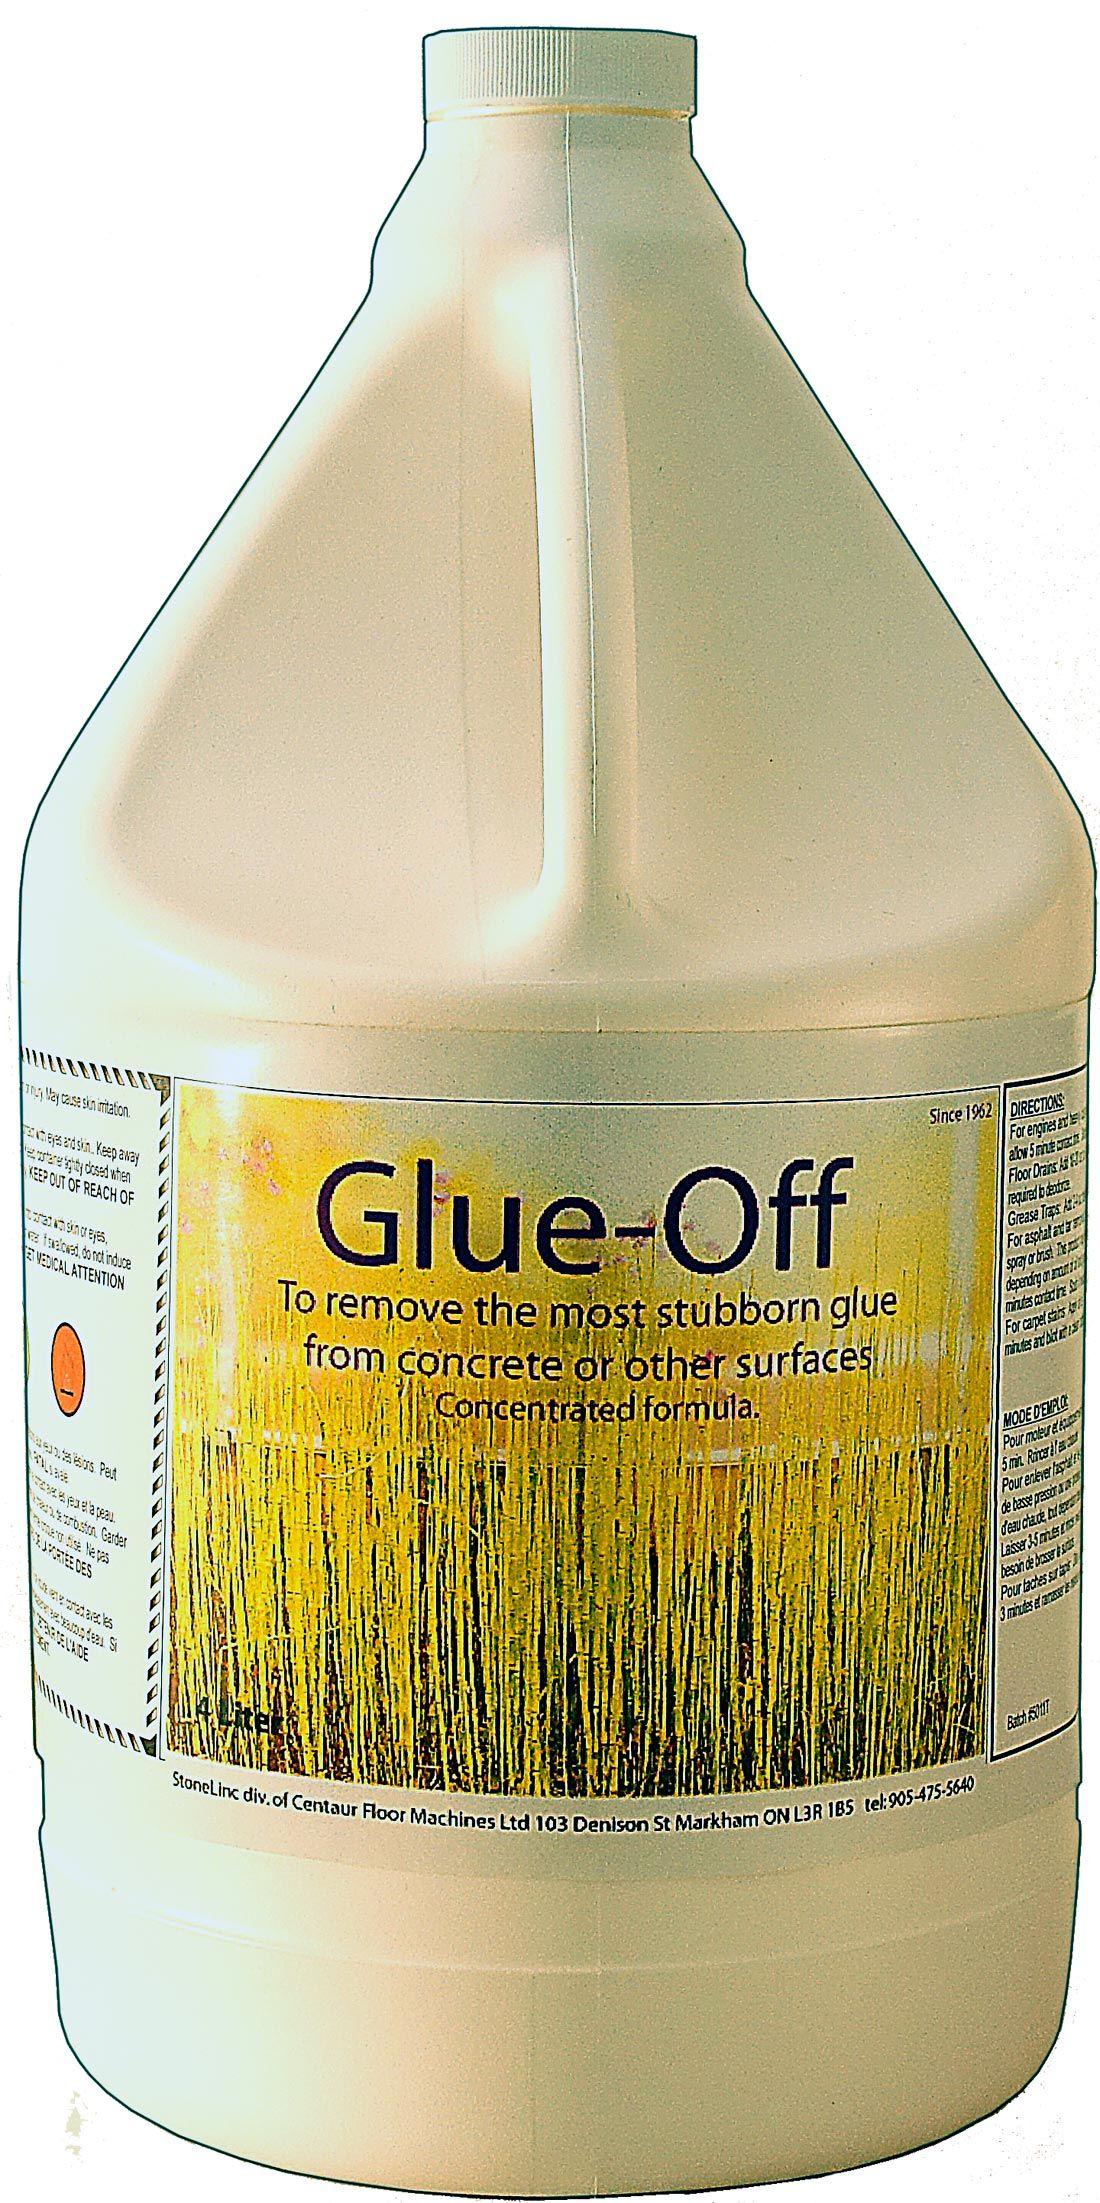 Removing Old Carpet Glue From Ceramic Tile Floors Carpet Glue